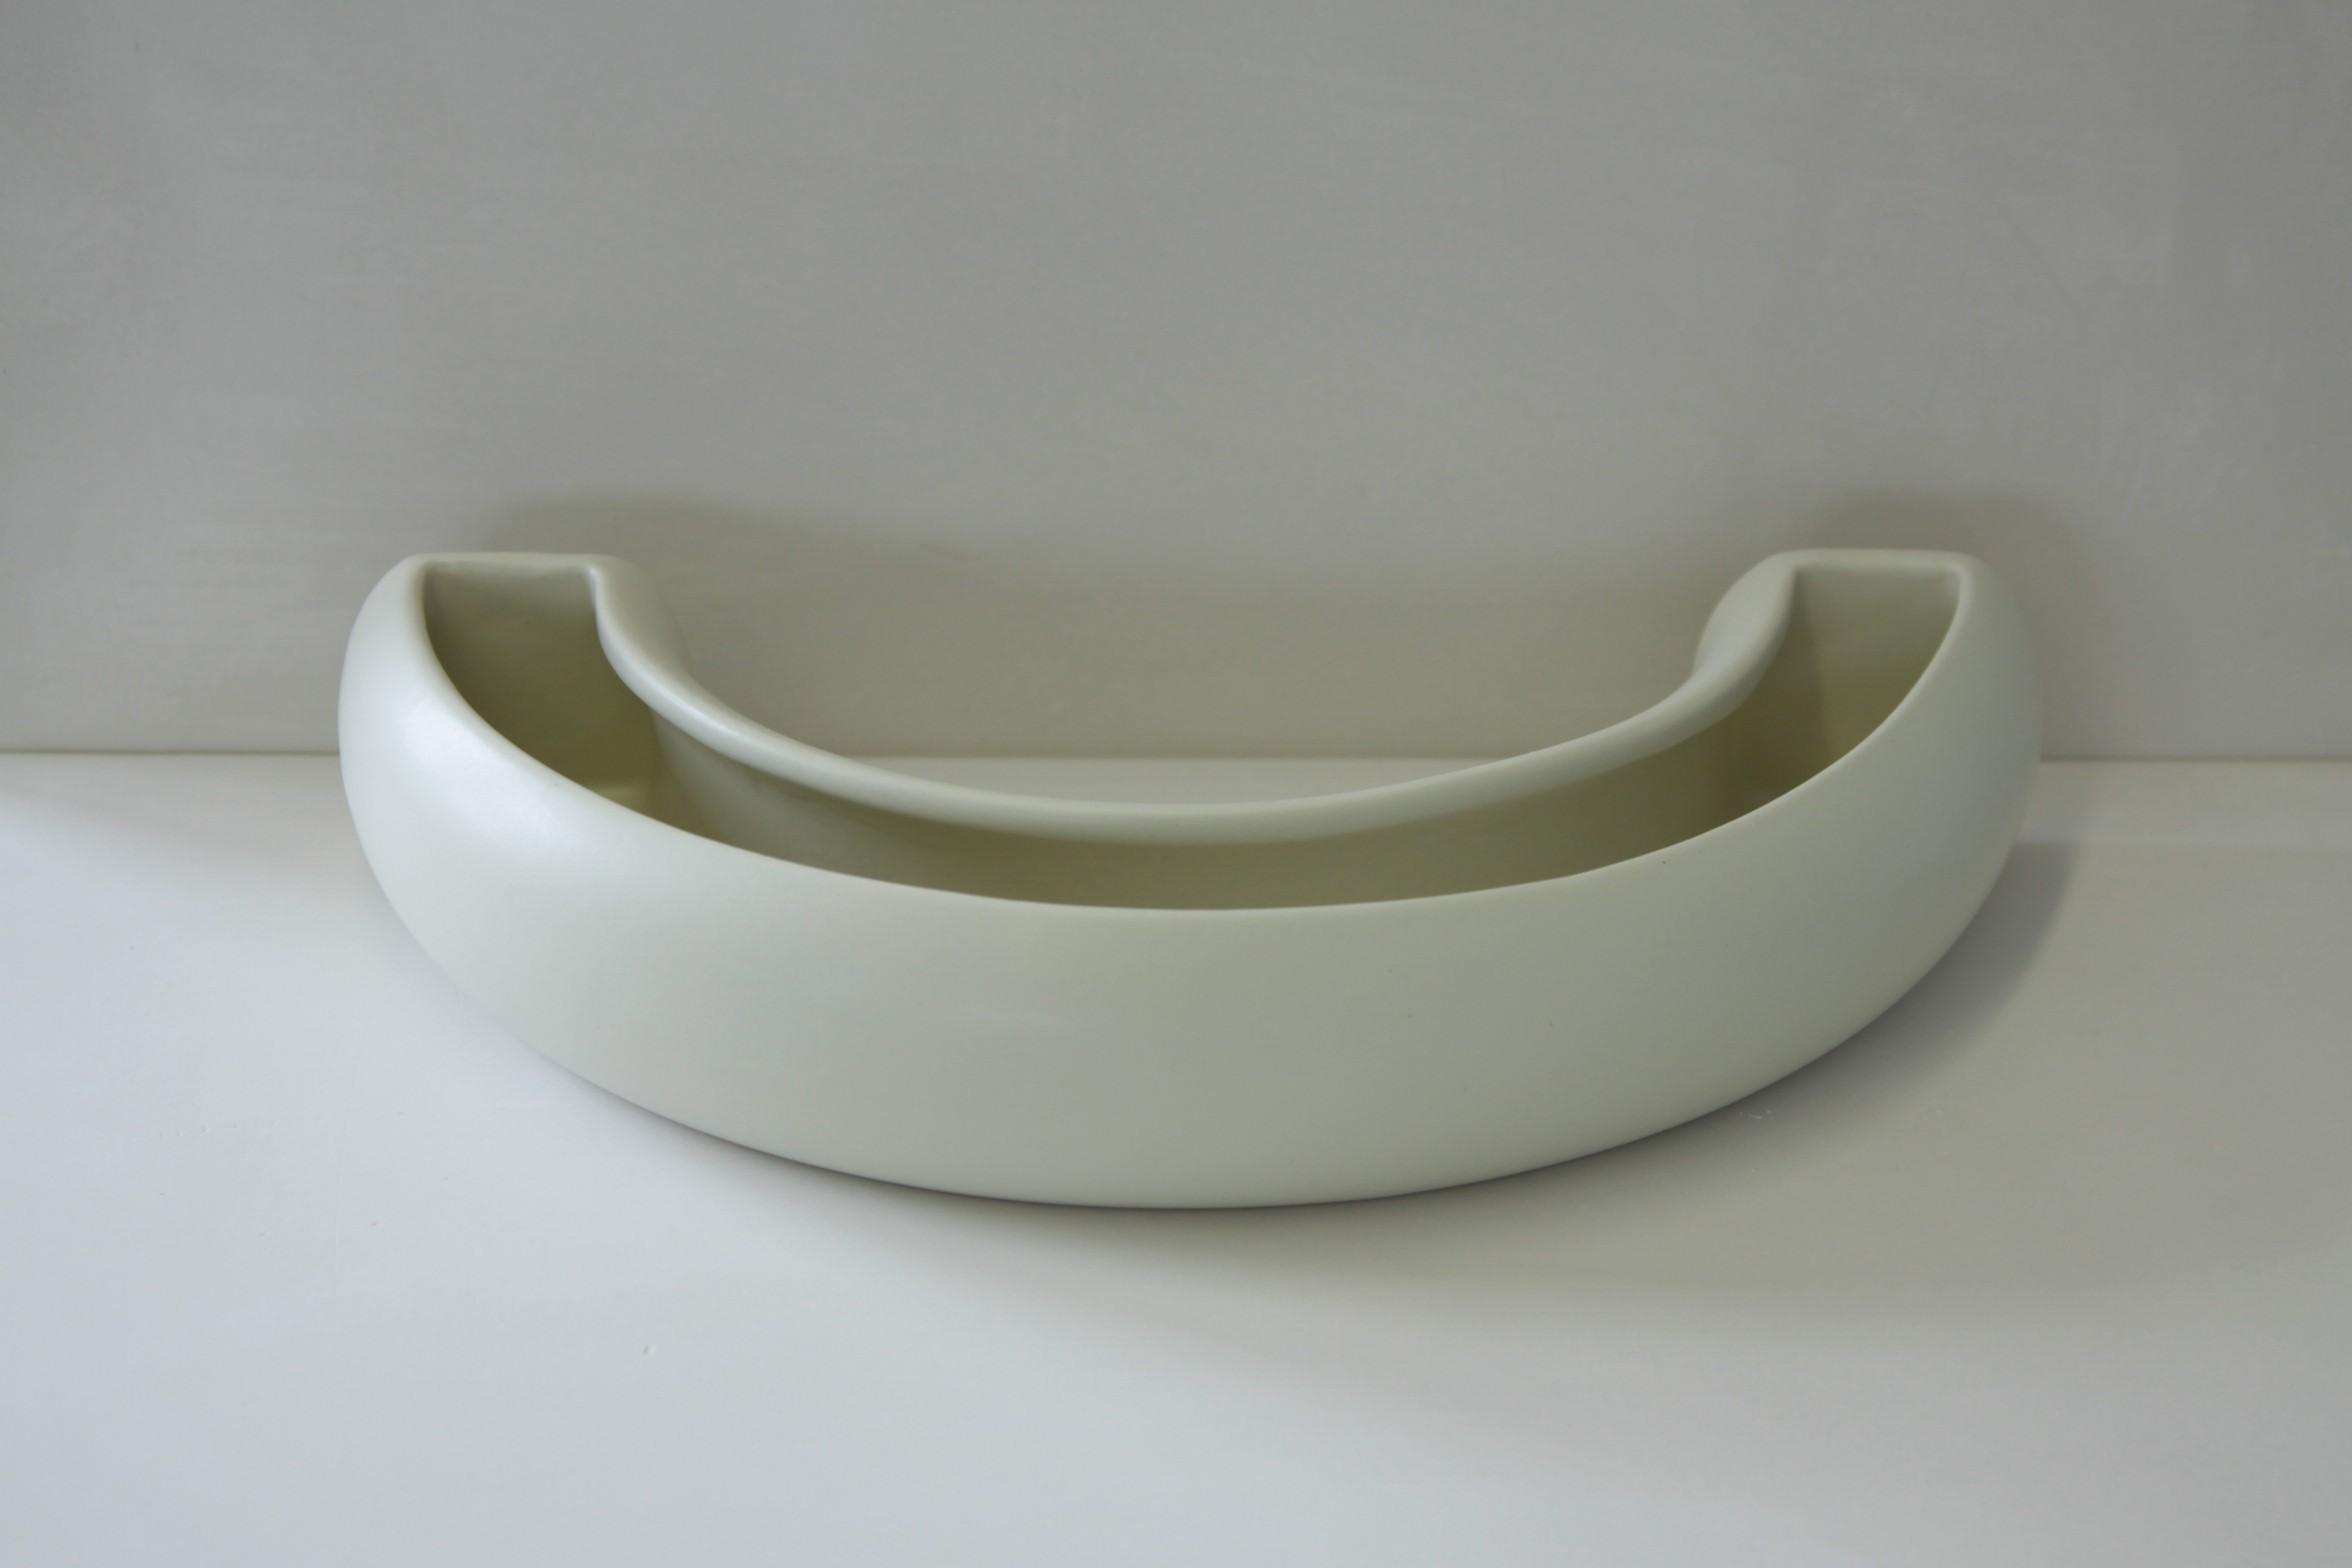 verdunster luftbefeuchter f r kamin fen porzellan. Black Bedroom Furniture Sets. Home Design Ideas